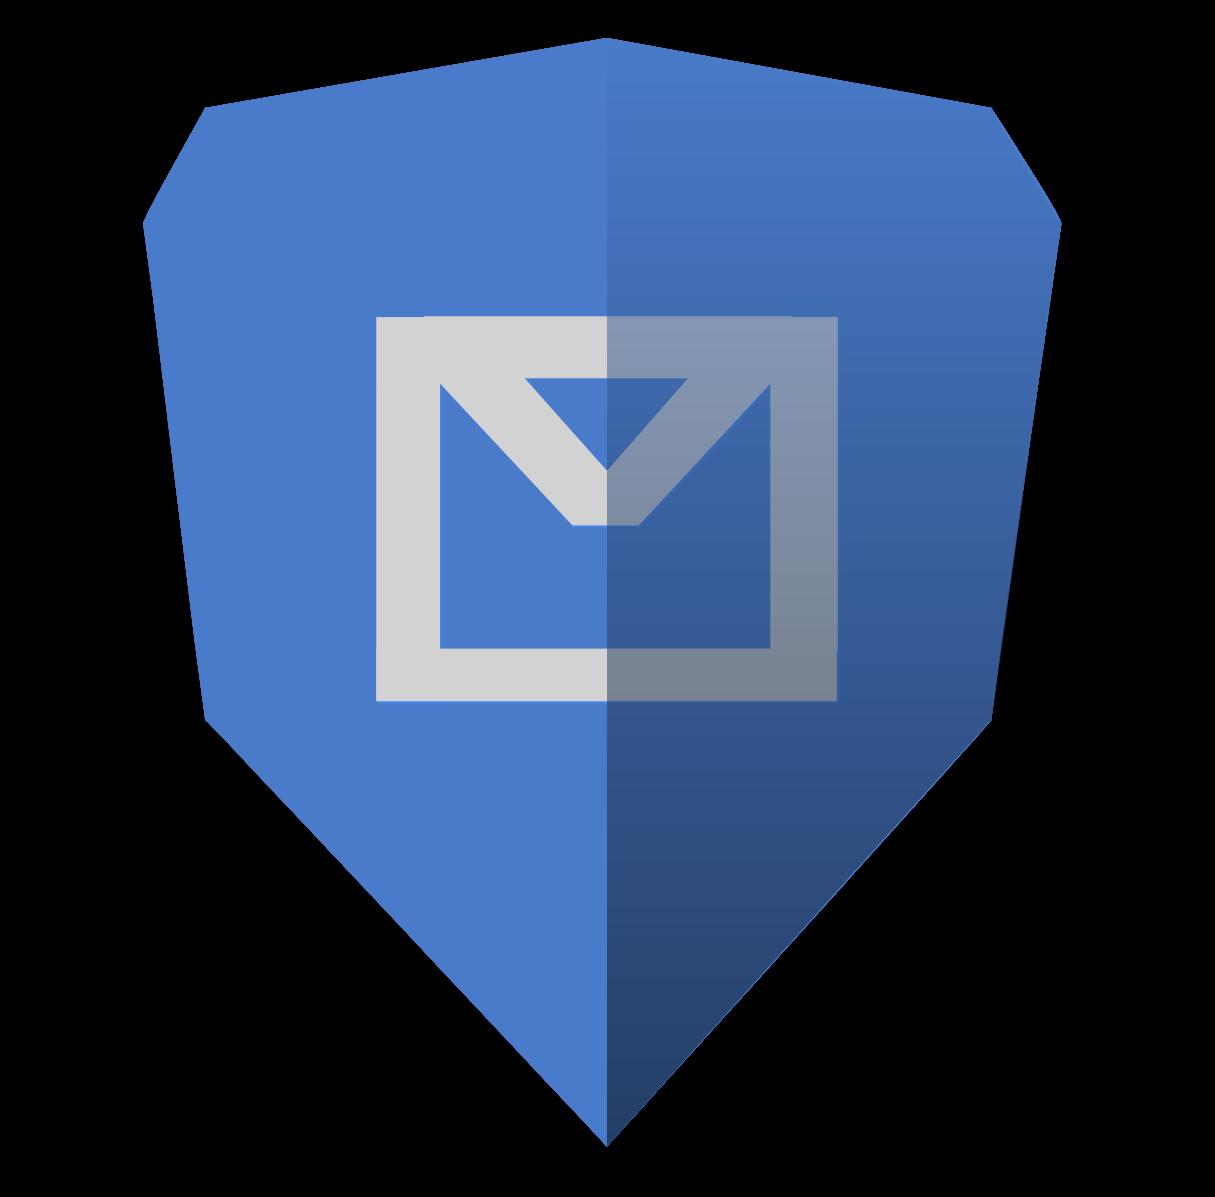 Mail Shield